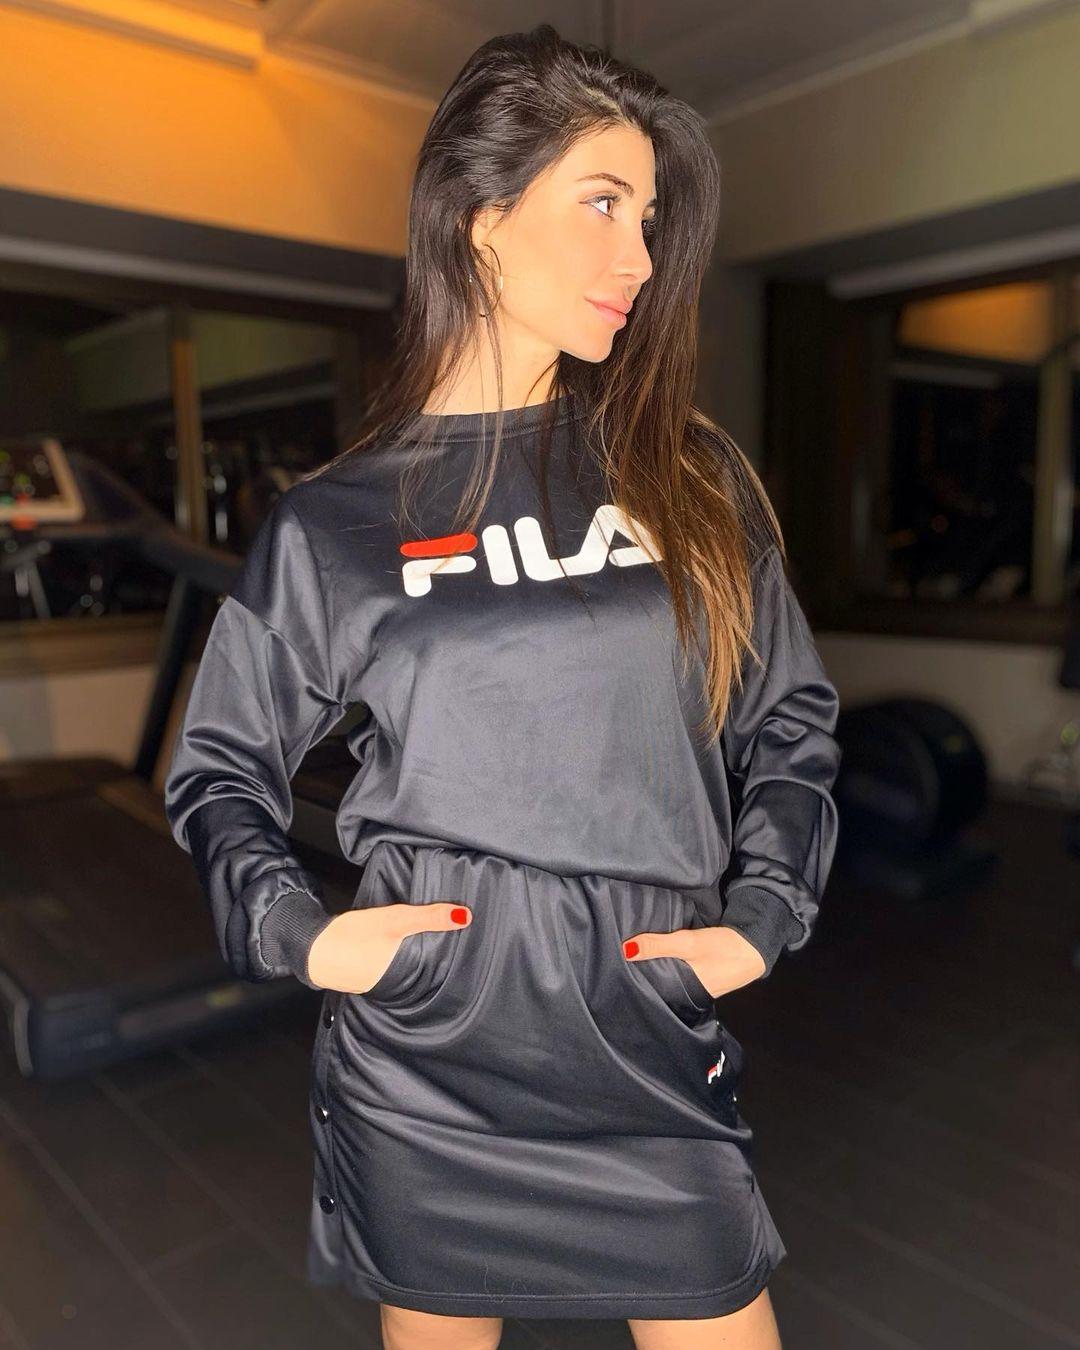 Elisabetta-Galimi-Wallpapers-Insta-Fit-Bio-2